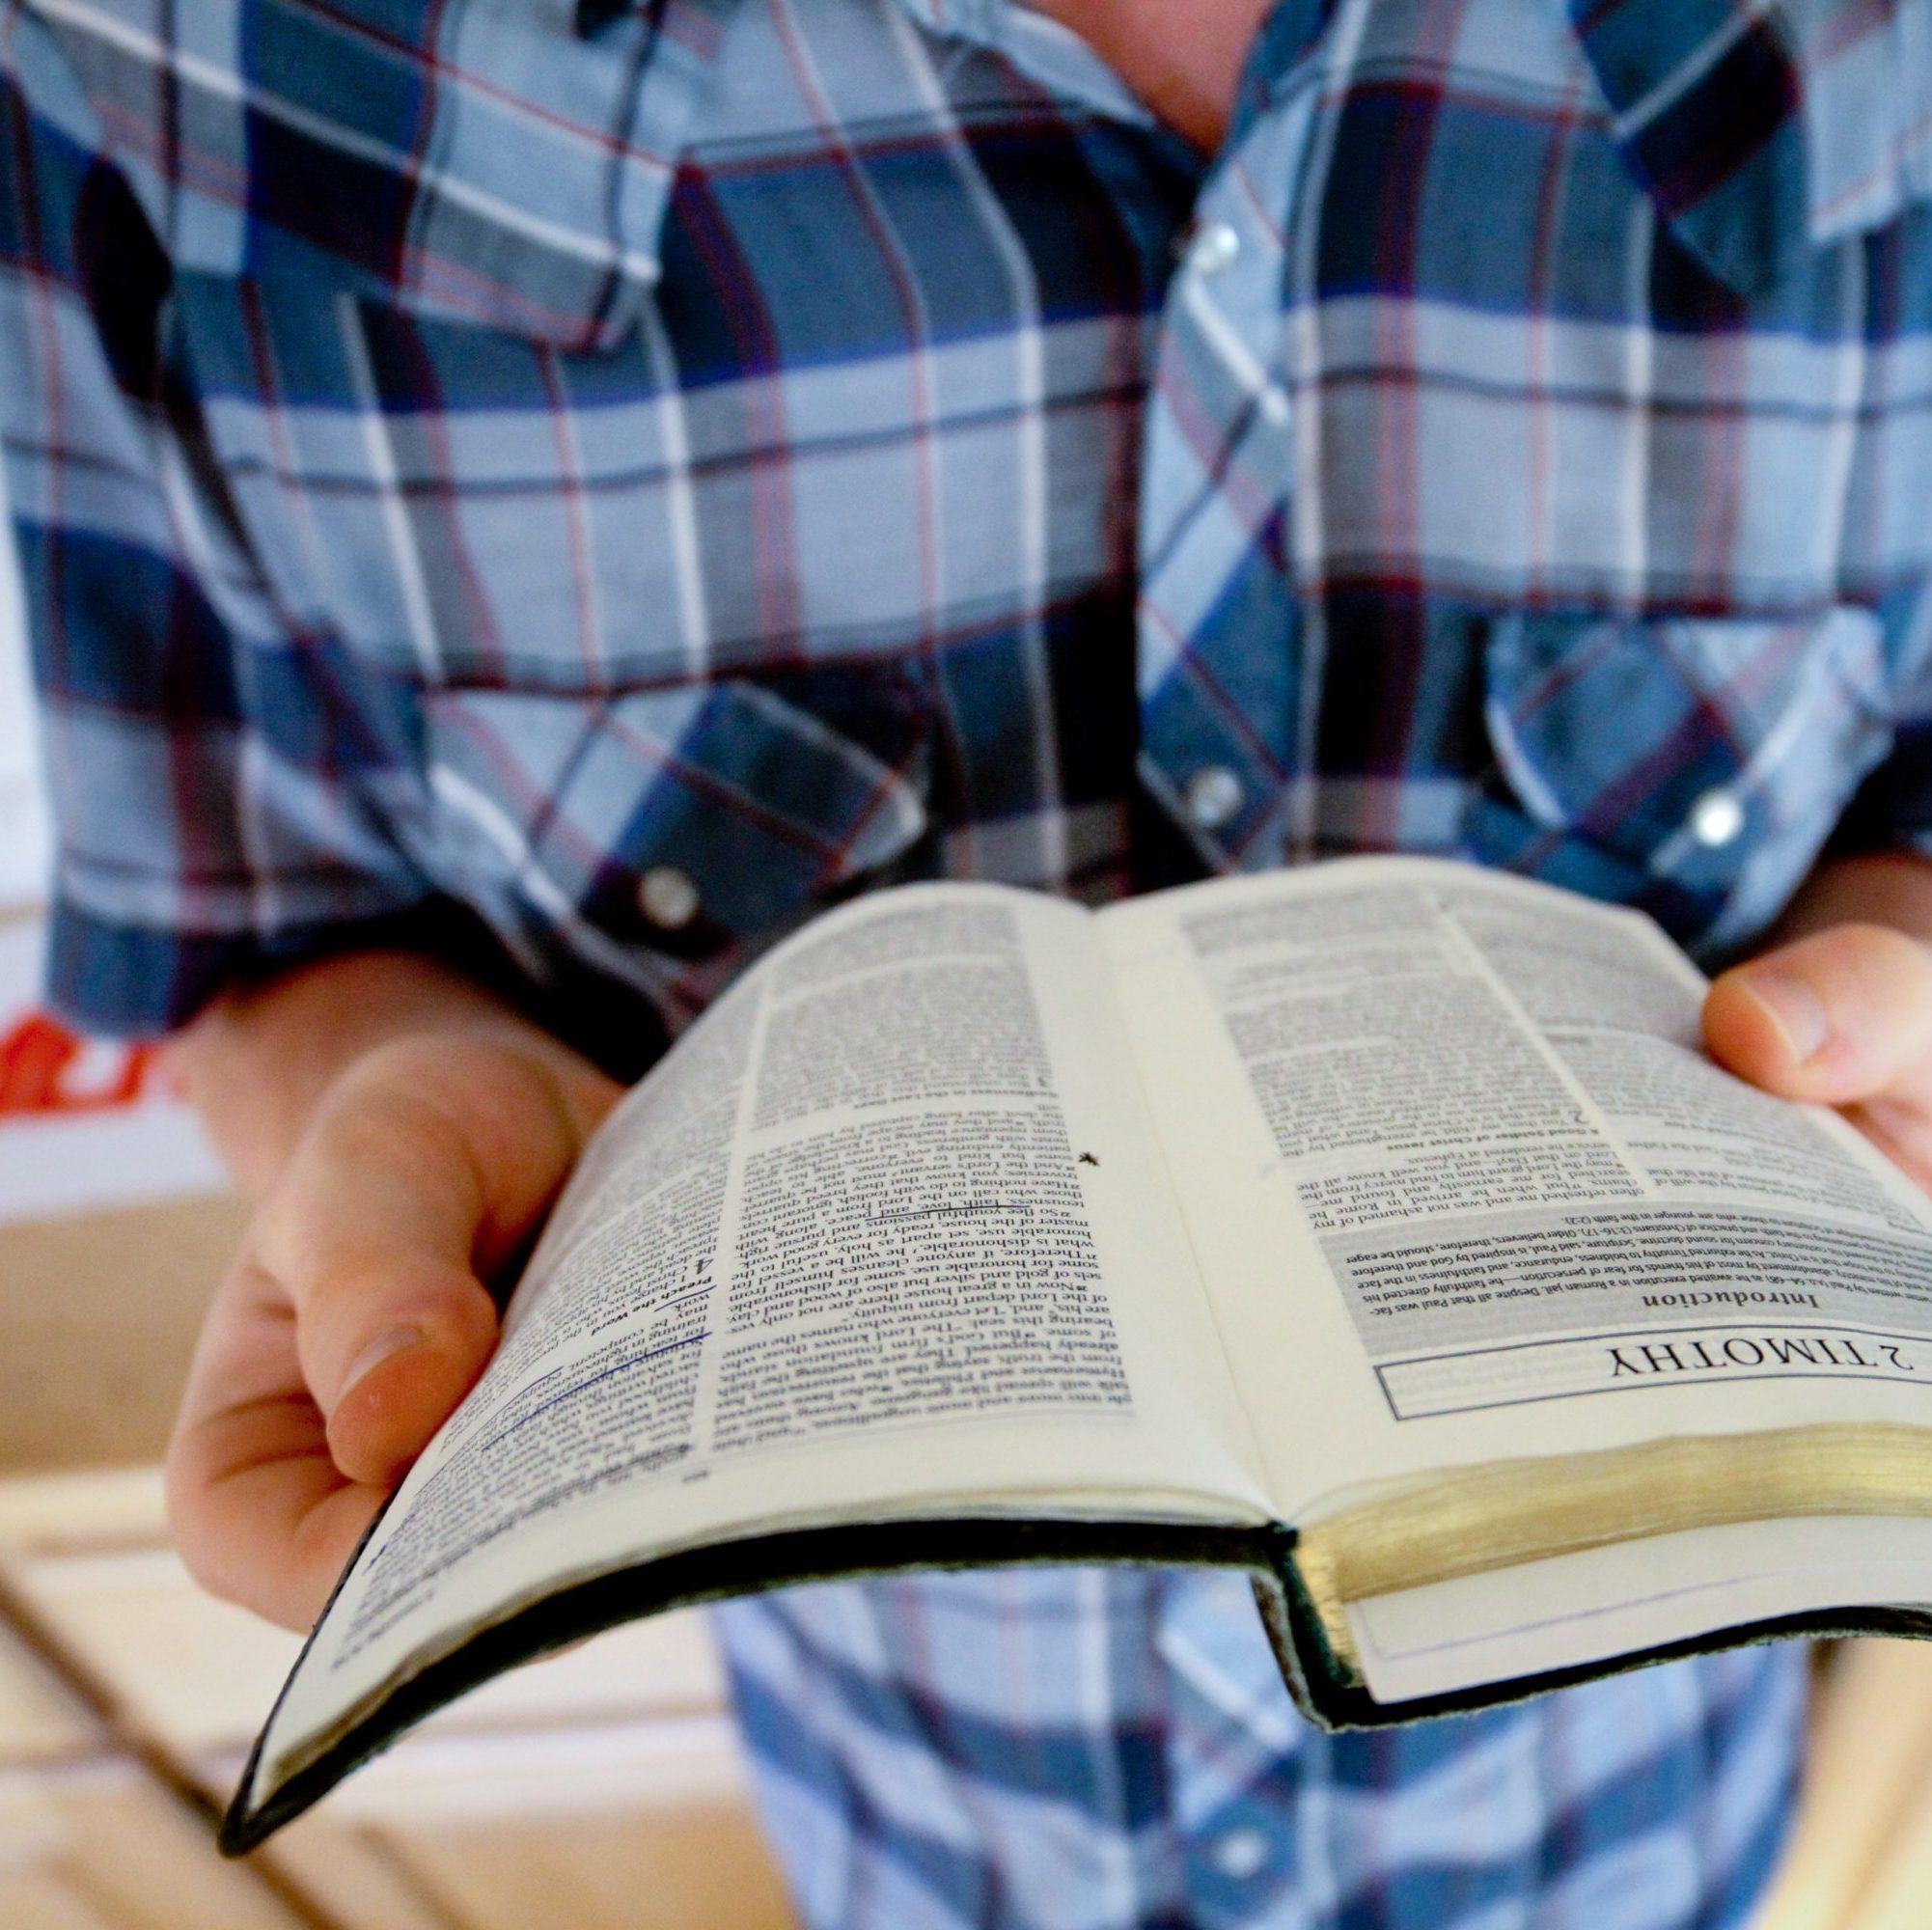 Bibel-lesen-Kinder-Unterricht-quadrat